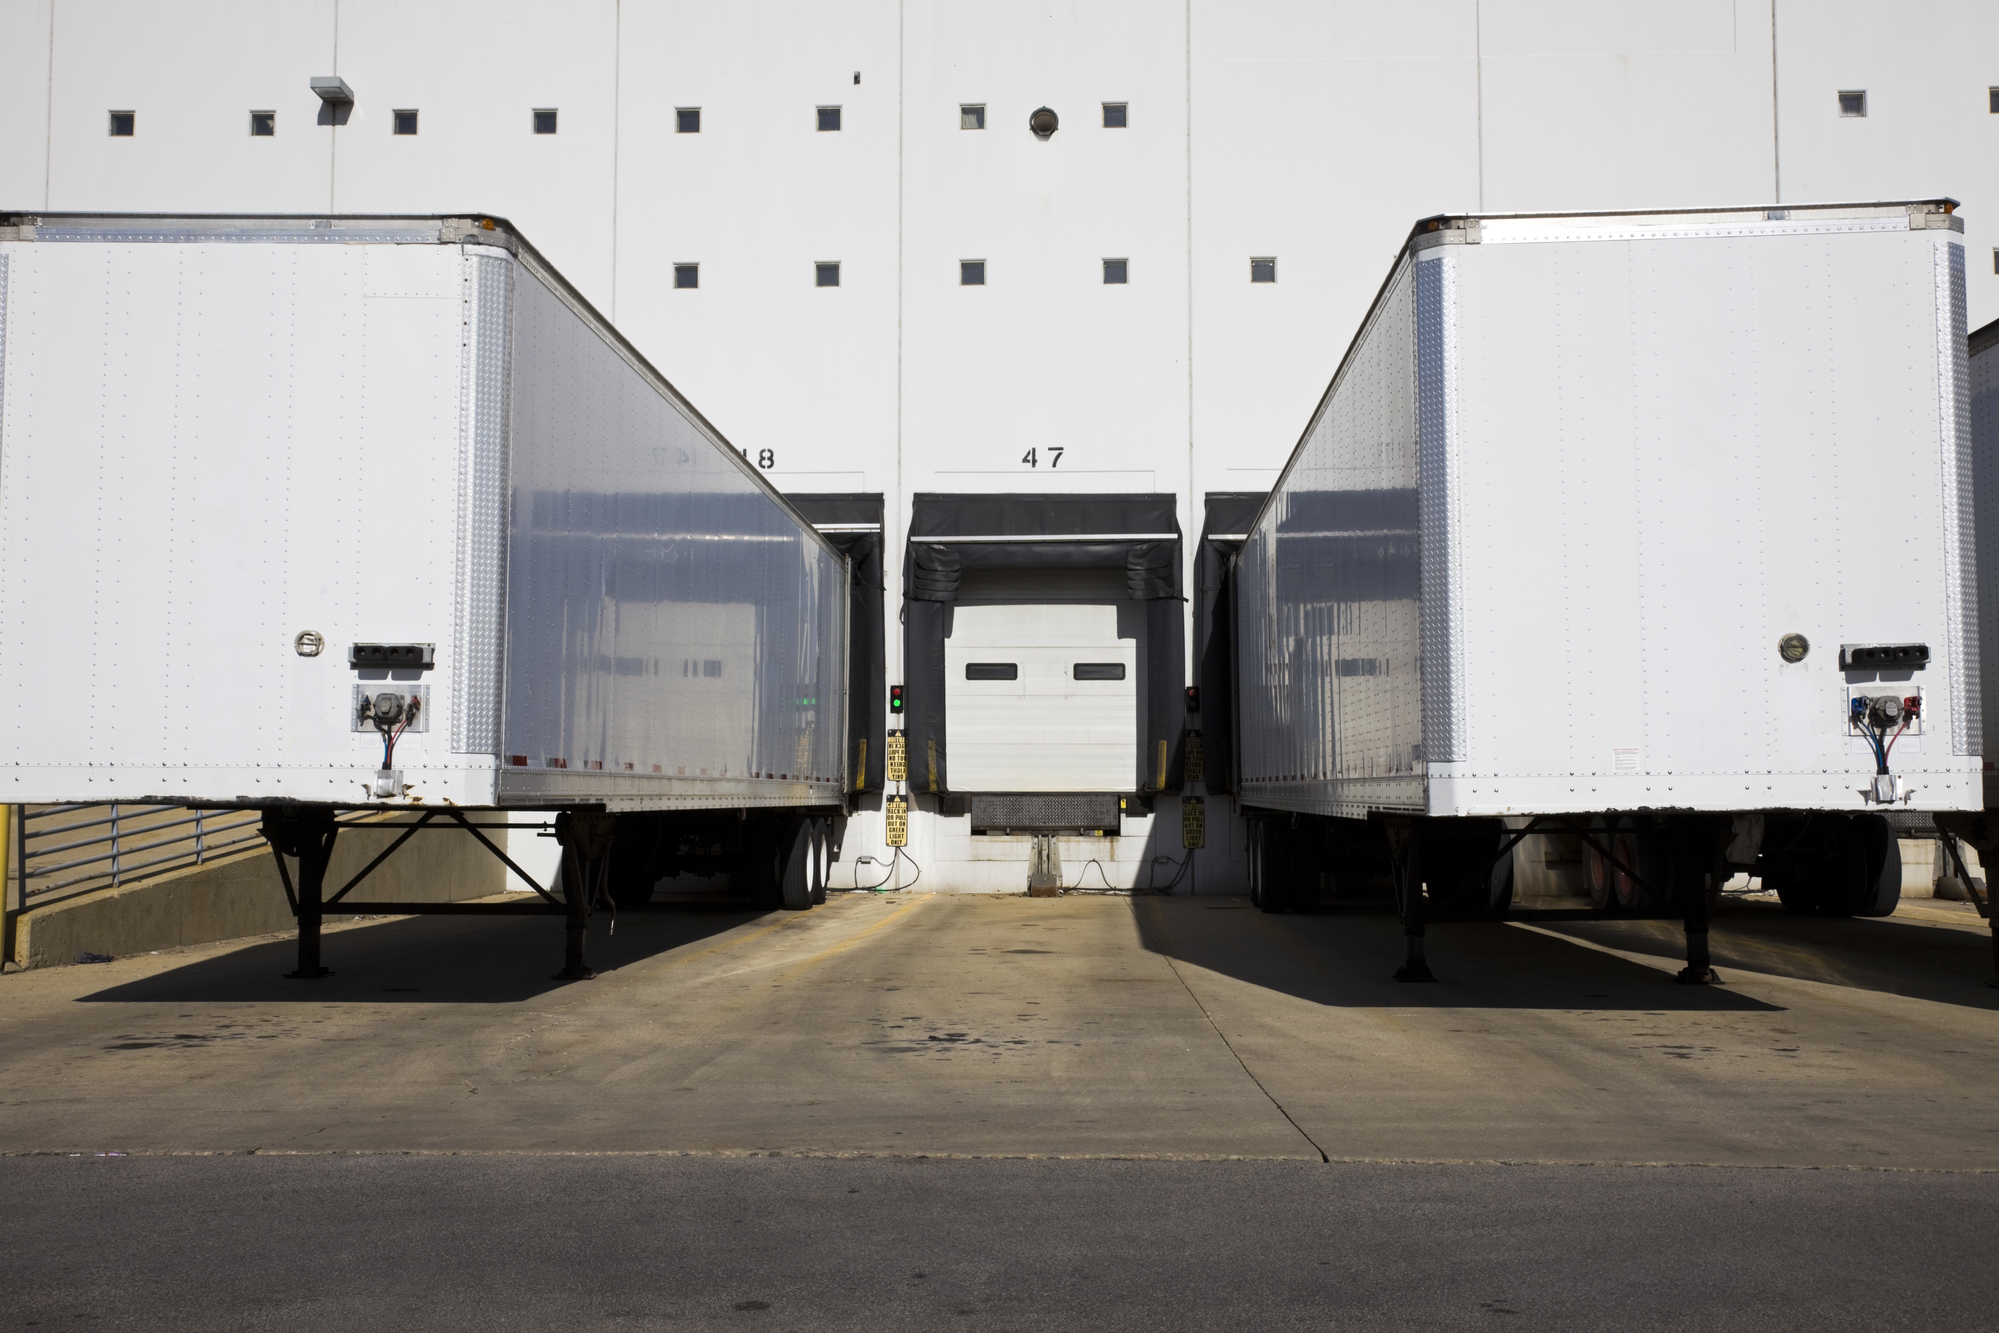 Trucks at loading dock